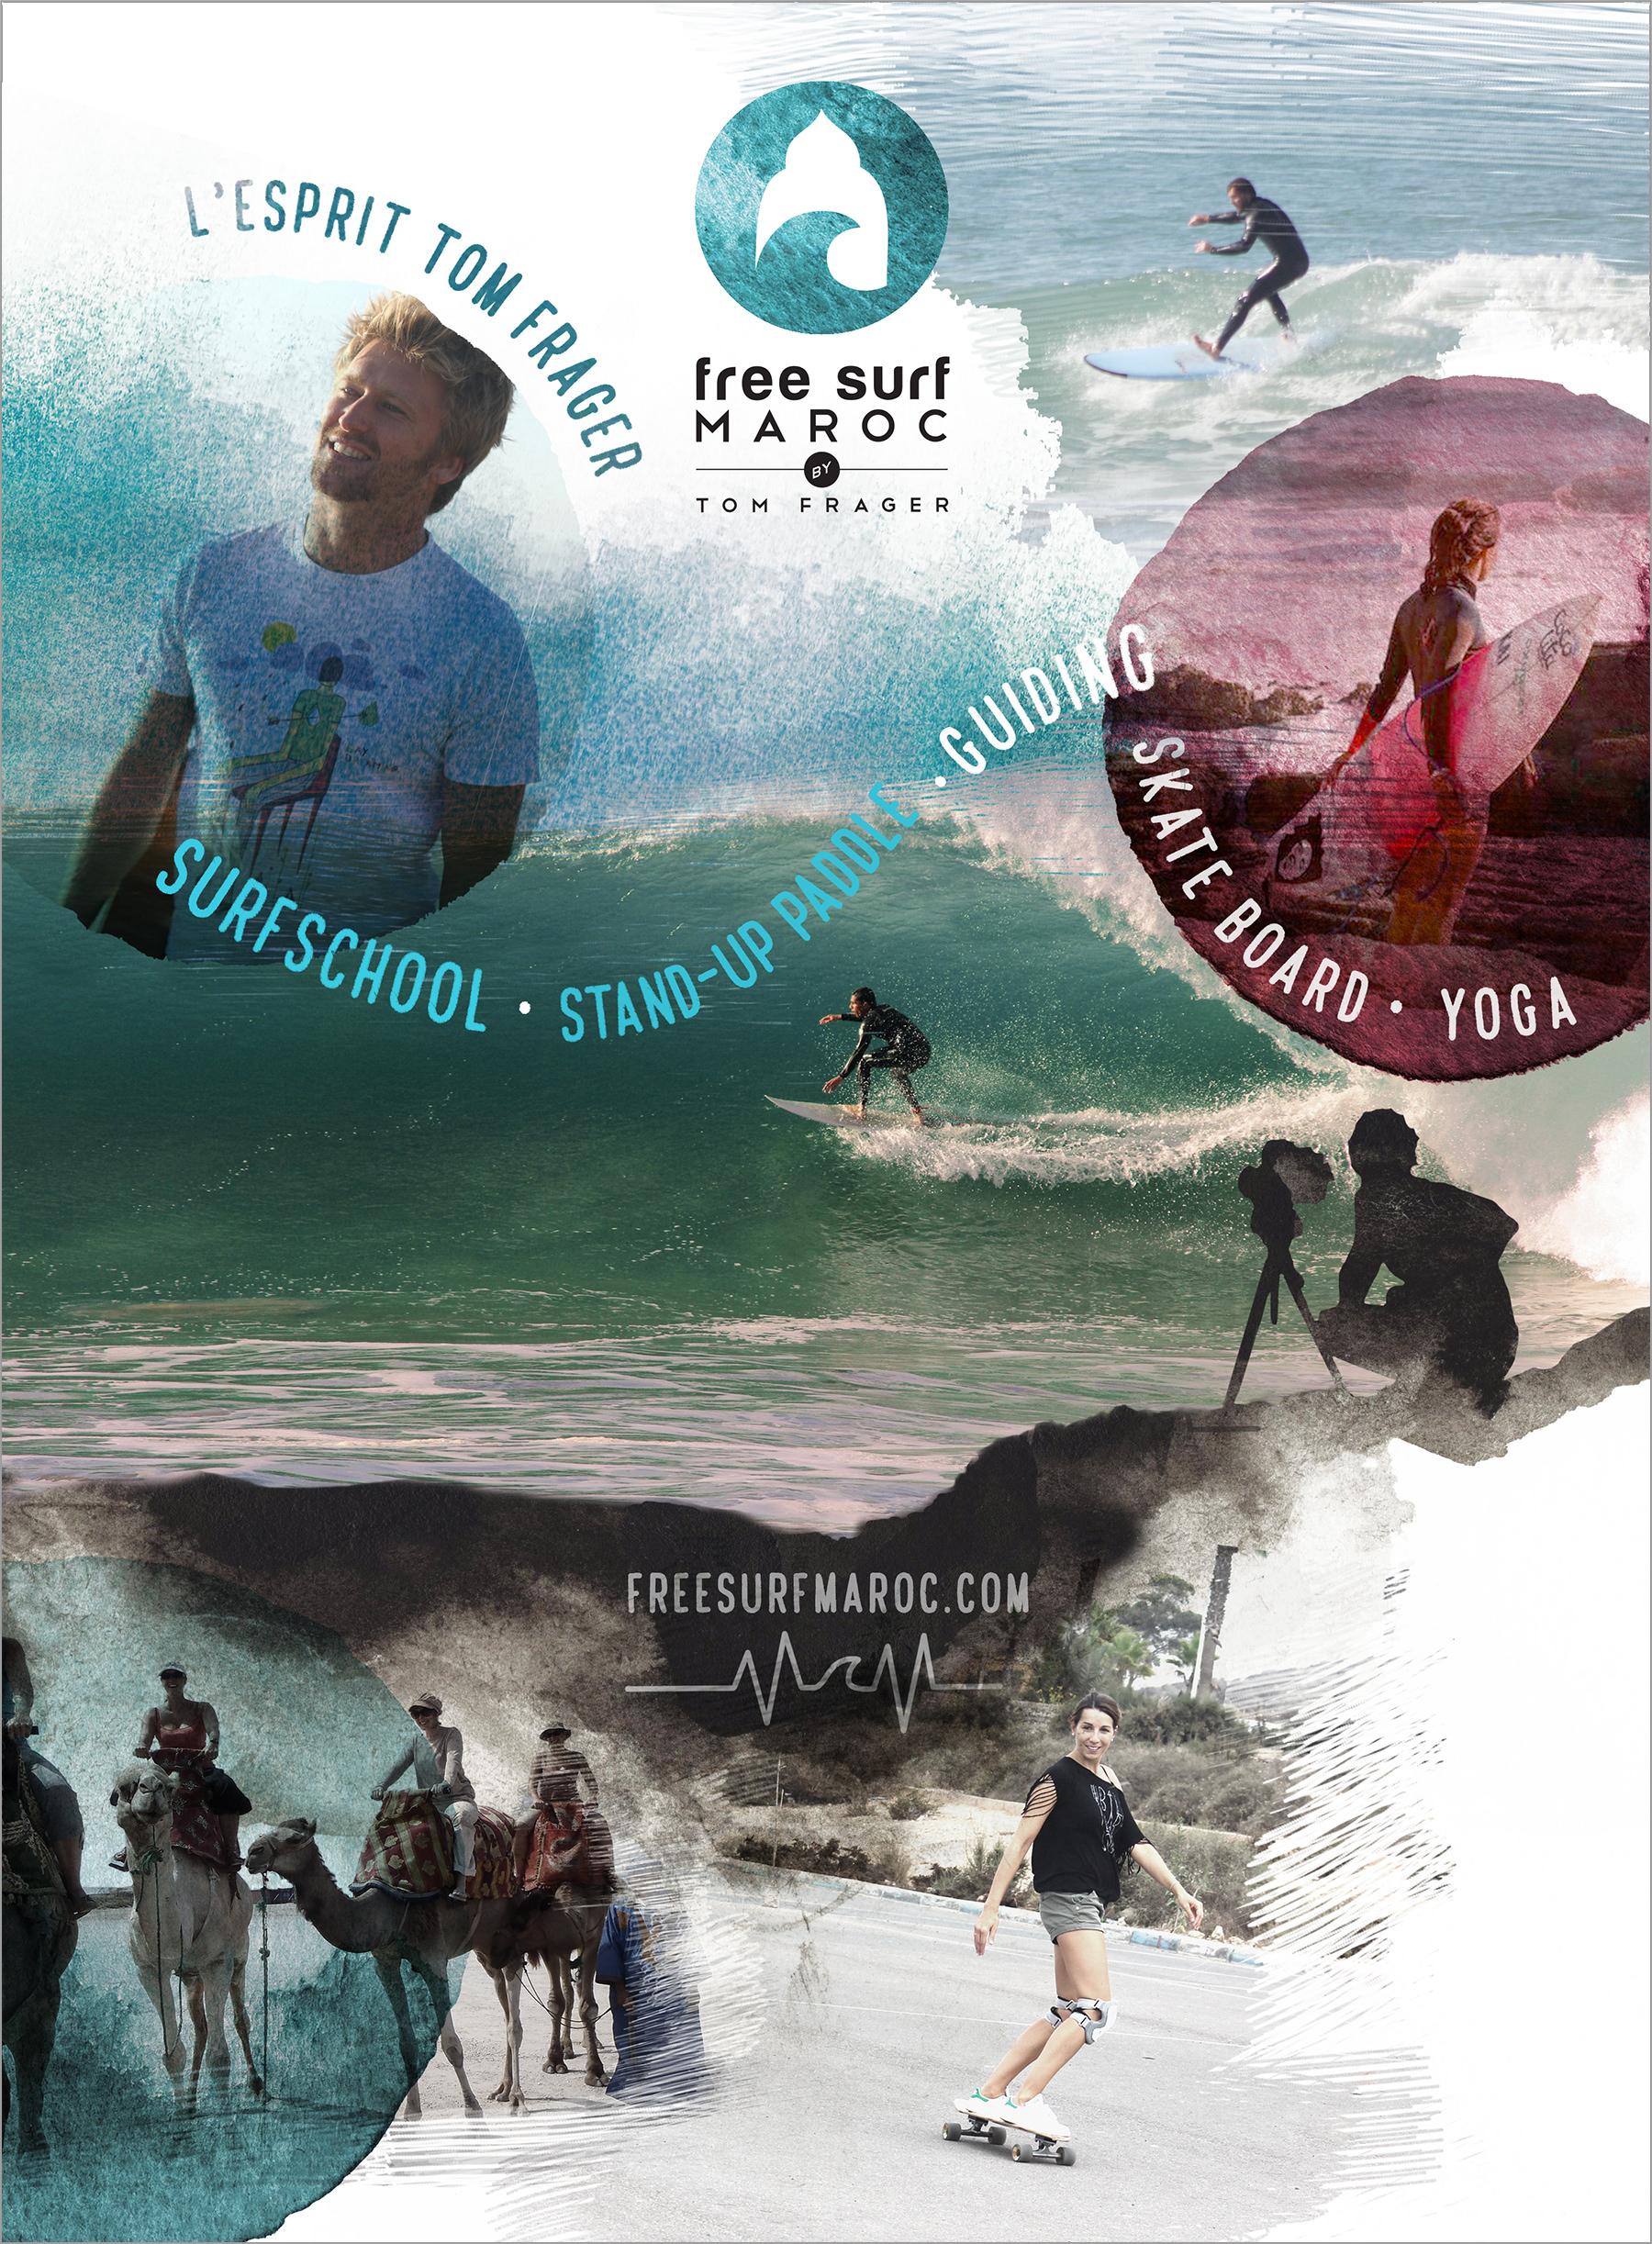 beachbrother-freesurfmaroc-vague-graphique-design-graphiste-vannes-morbihan